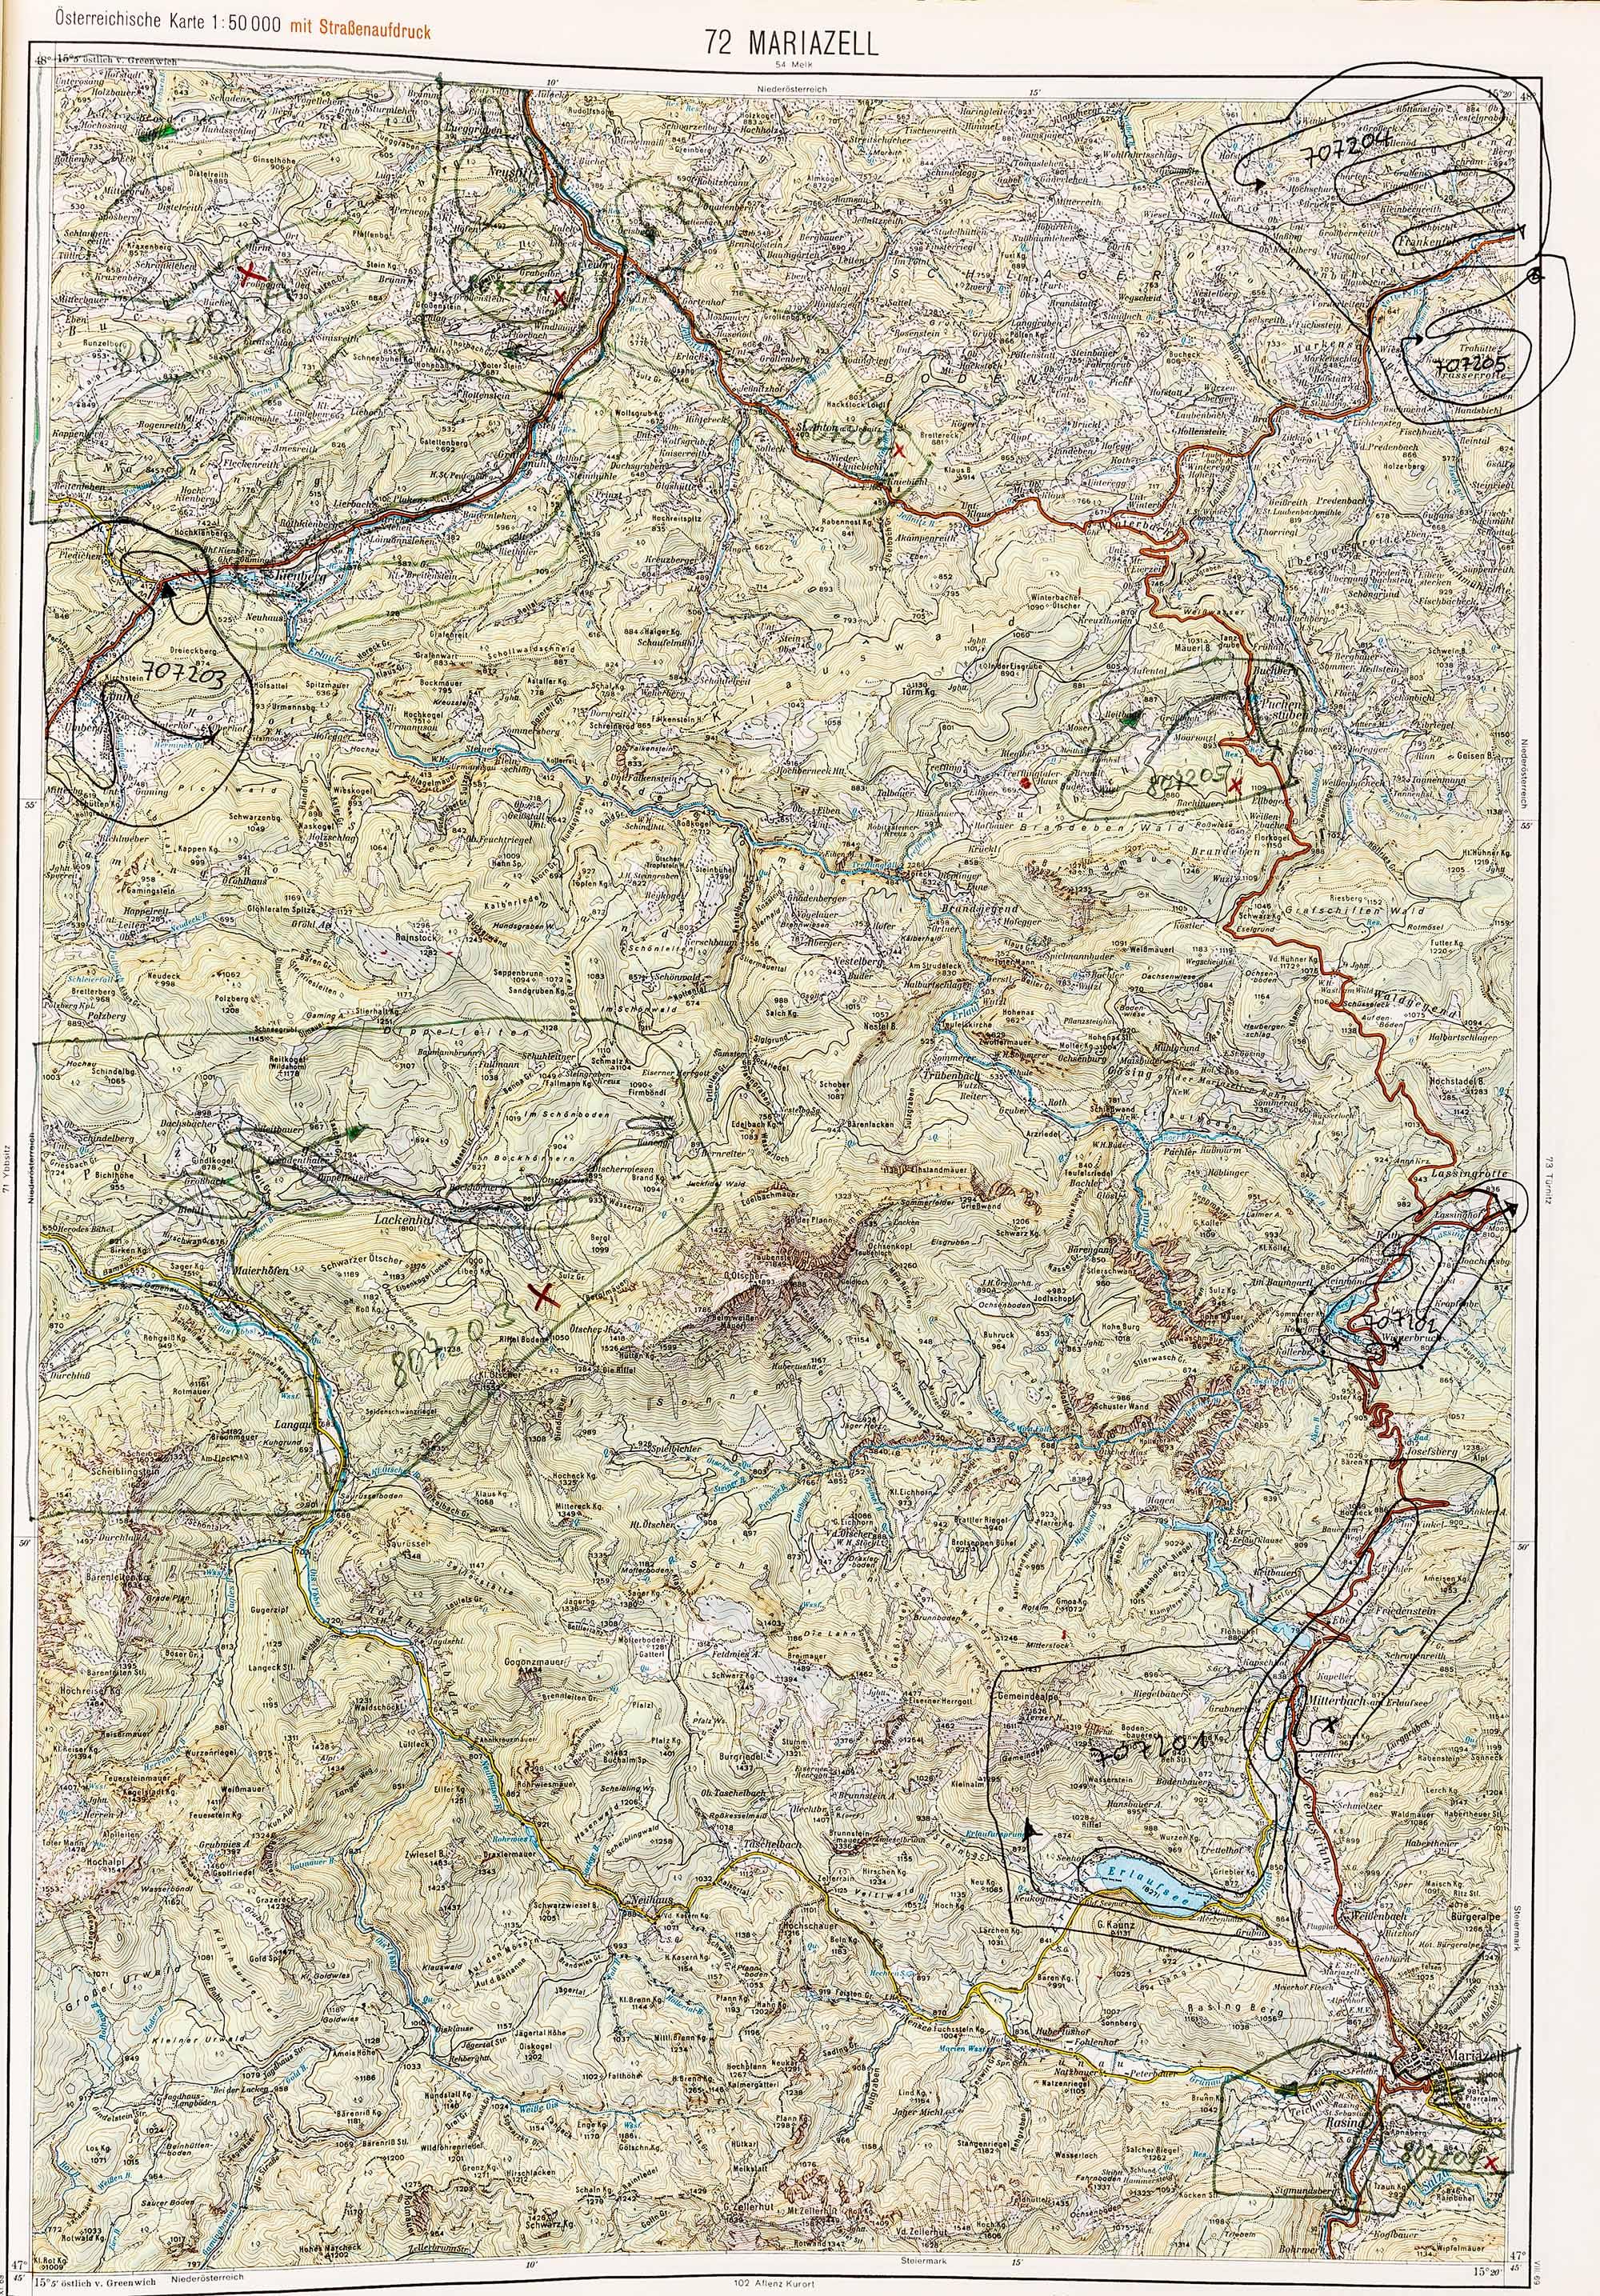 1975-1979 Karte 072